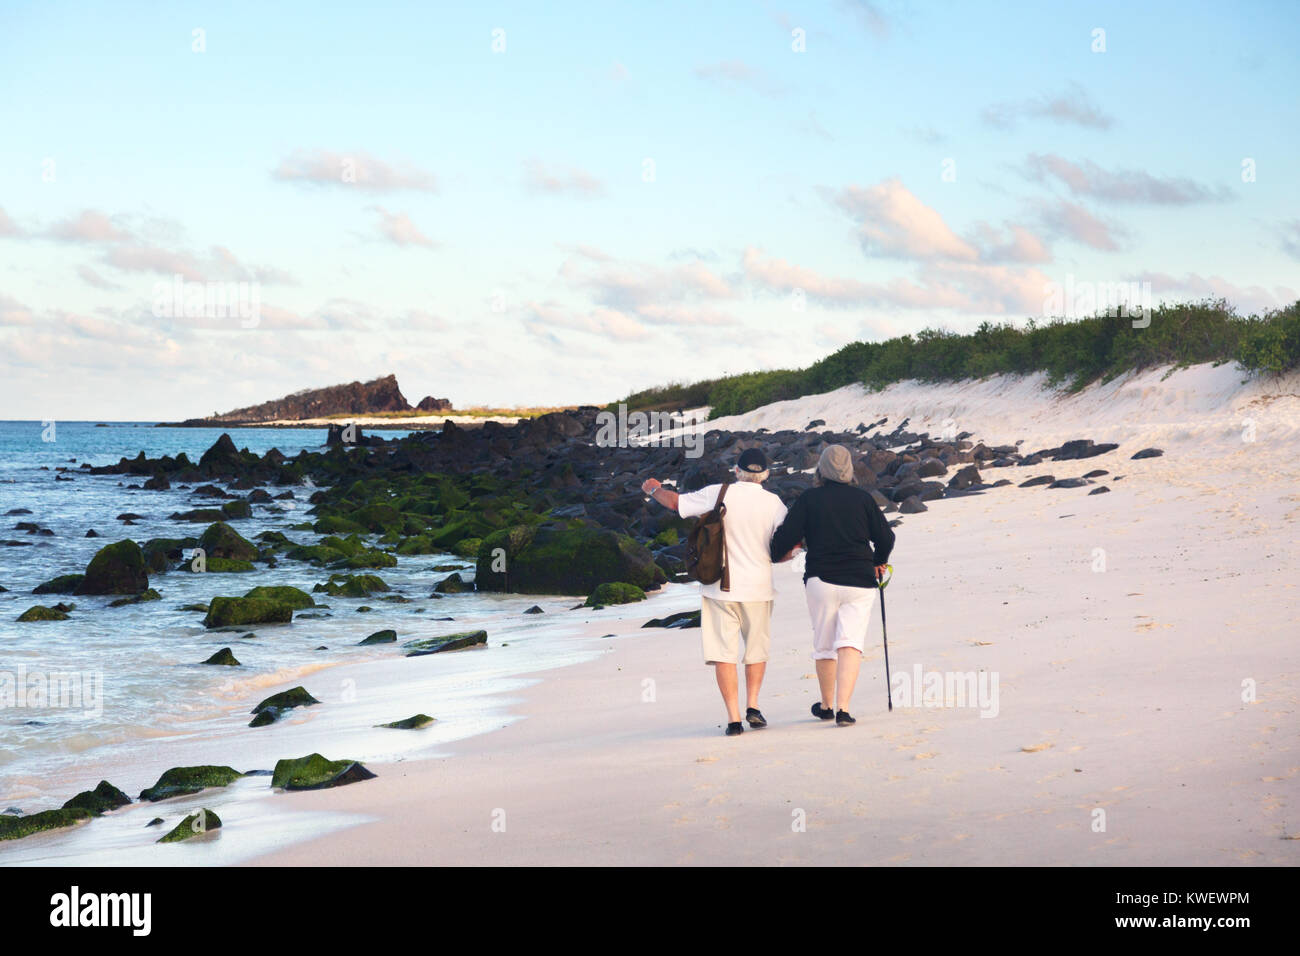 Ein älteres Ehepaar zu Fuß am Strand, Espanola Island, Galapagos Inseln Ecuador Südamerika - Beispiel Stockbild